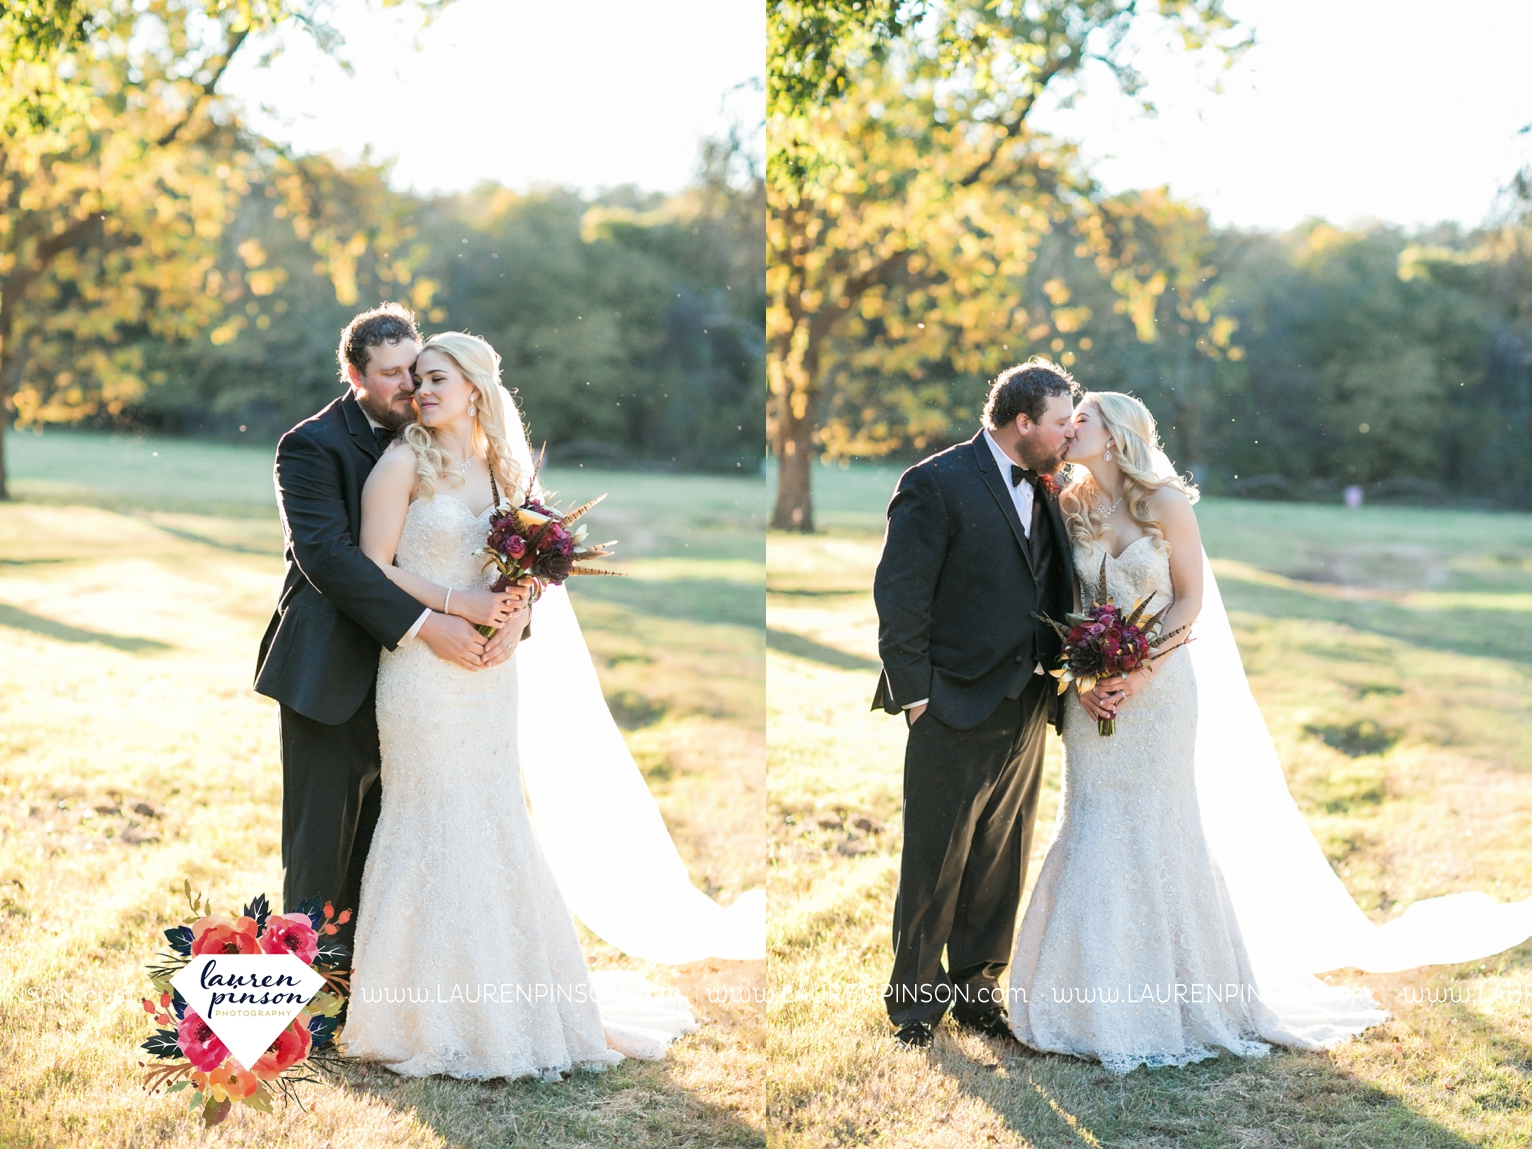 rustic-wichita-falls-texas-wedding-photographer-gold-glam-mayfield-events-market-street-united-allue-bridals-fall_1766.jpg